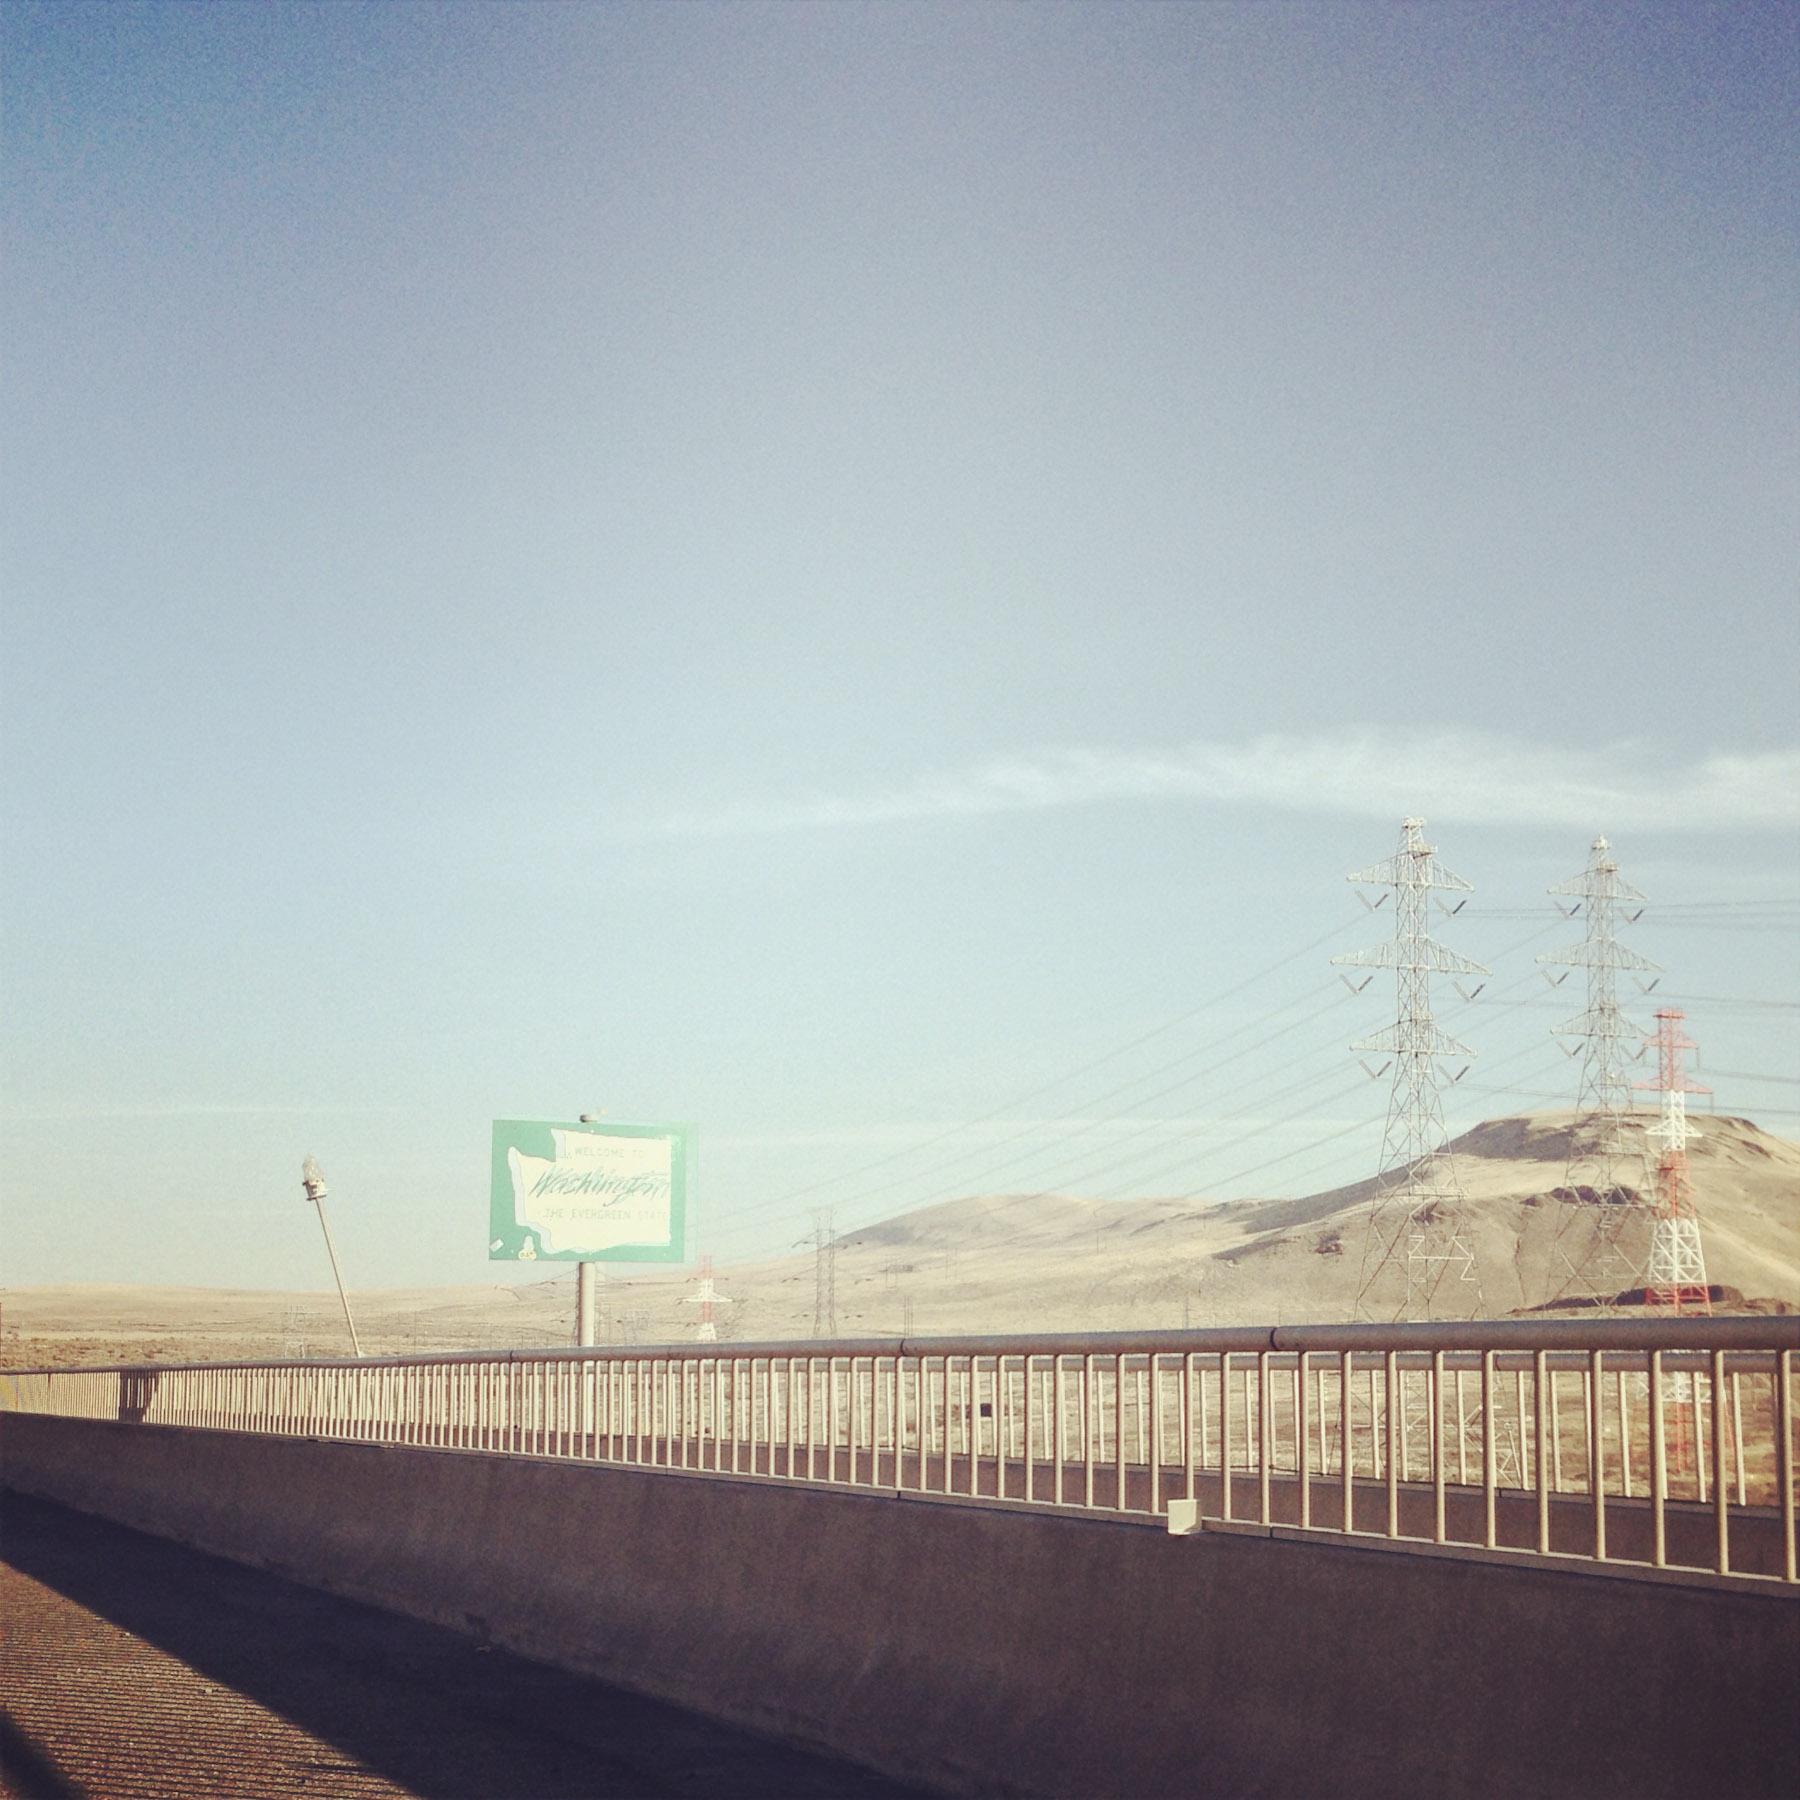 Crossing into Washington